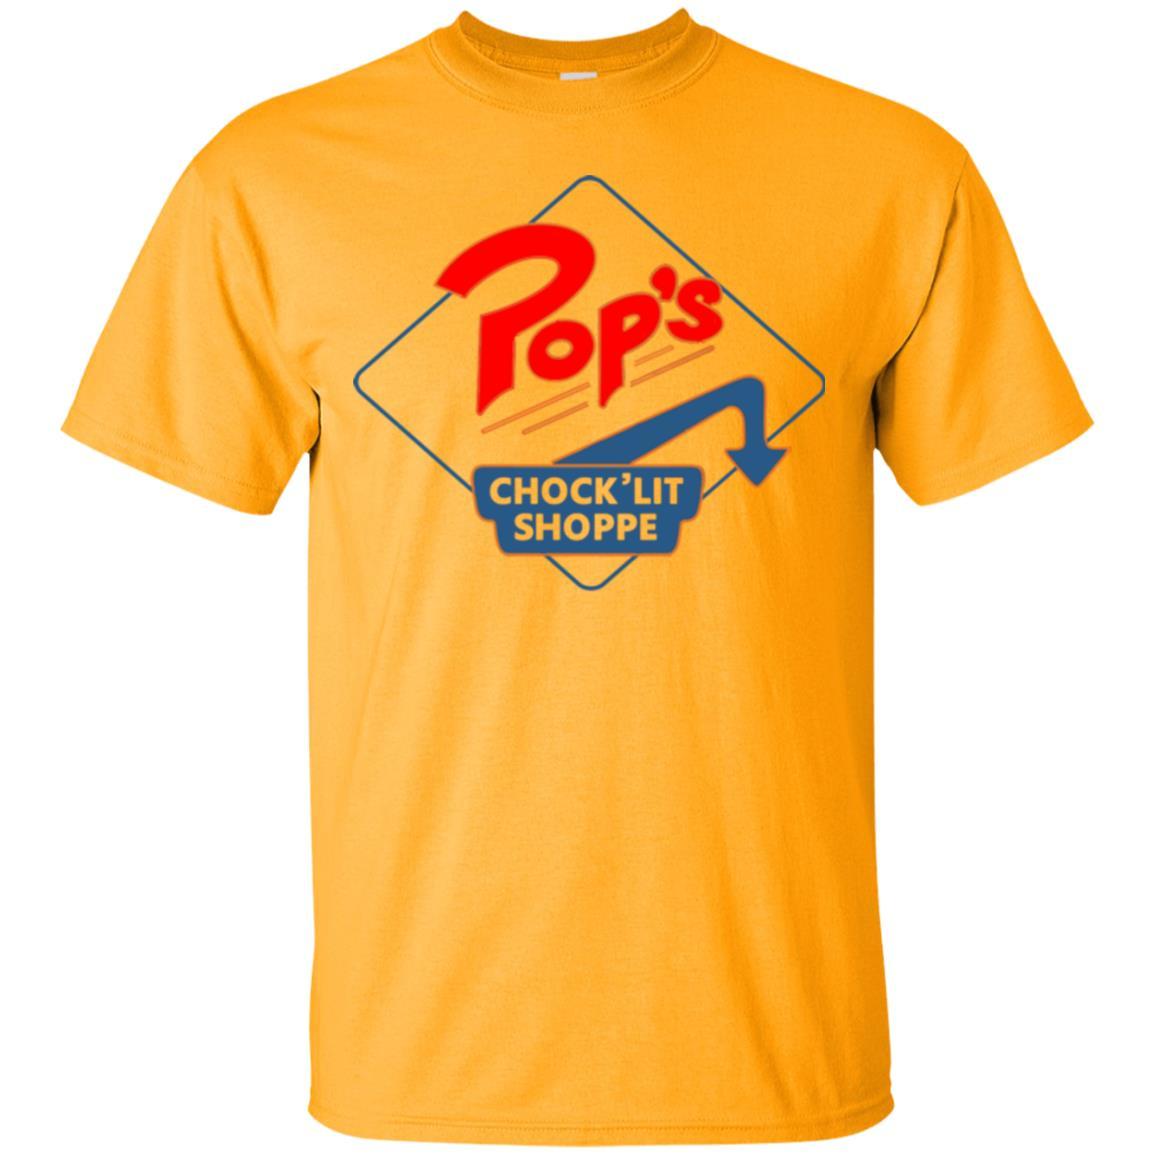 image 2084 - Riverdale Pop's Chock'lit Shoppe shirt